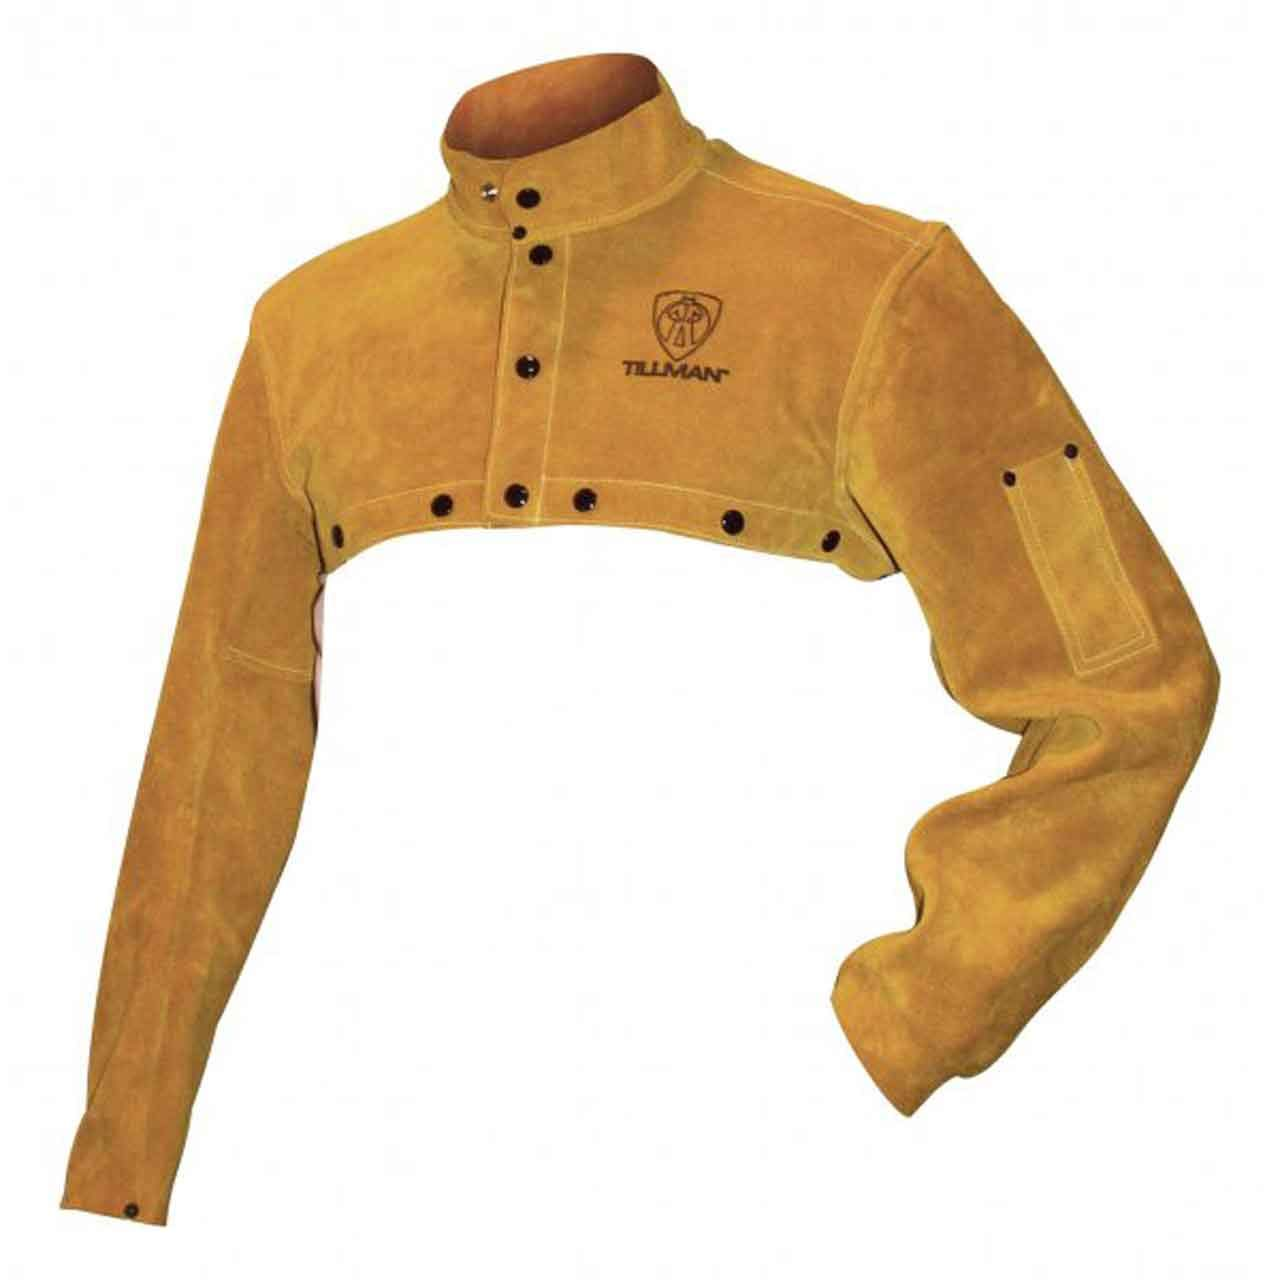 Tillman Bourbon brown Medium Leather/Kevlar Cape Sleeve - TIL3221M [PRICE is per EACH]